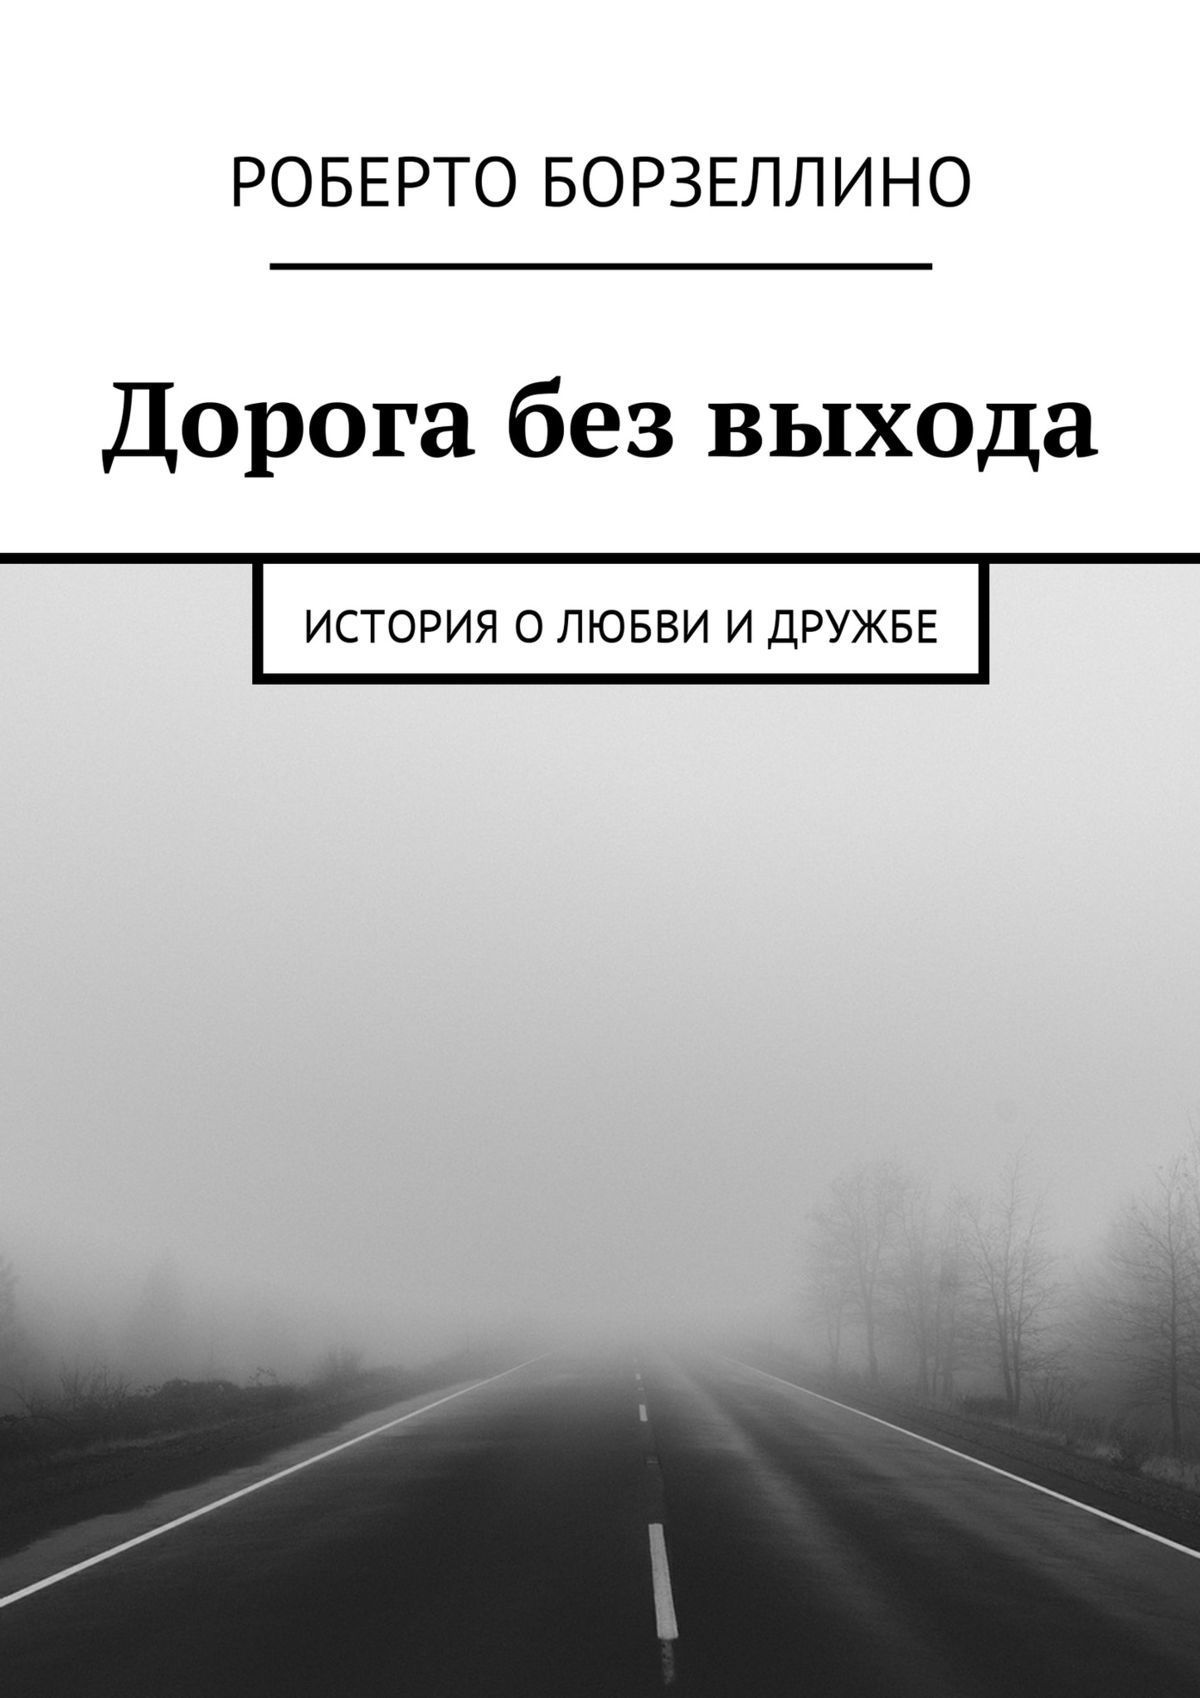 Роберто Борзеллино Дорога без выхода. История олюбви идружбе автомобиль в минске фото